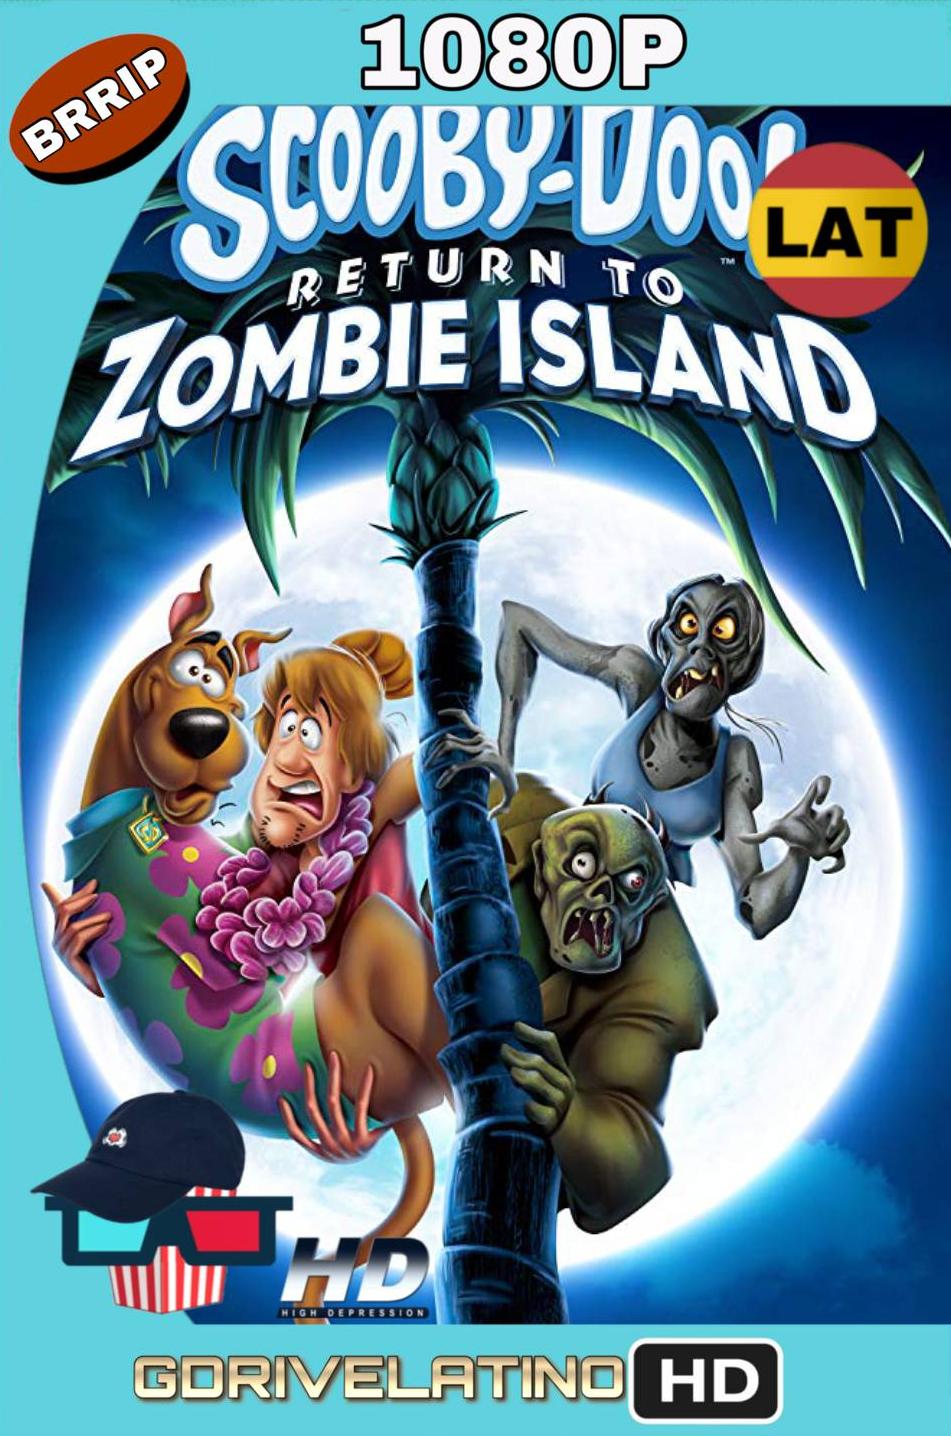 Scooby Doo! Return to Zombie Island (2019) BRRip 1080p Latino-Ingles MKV